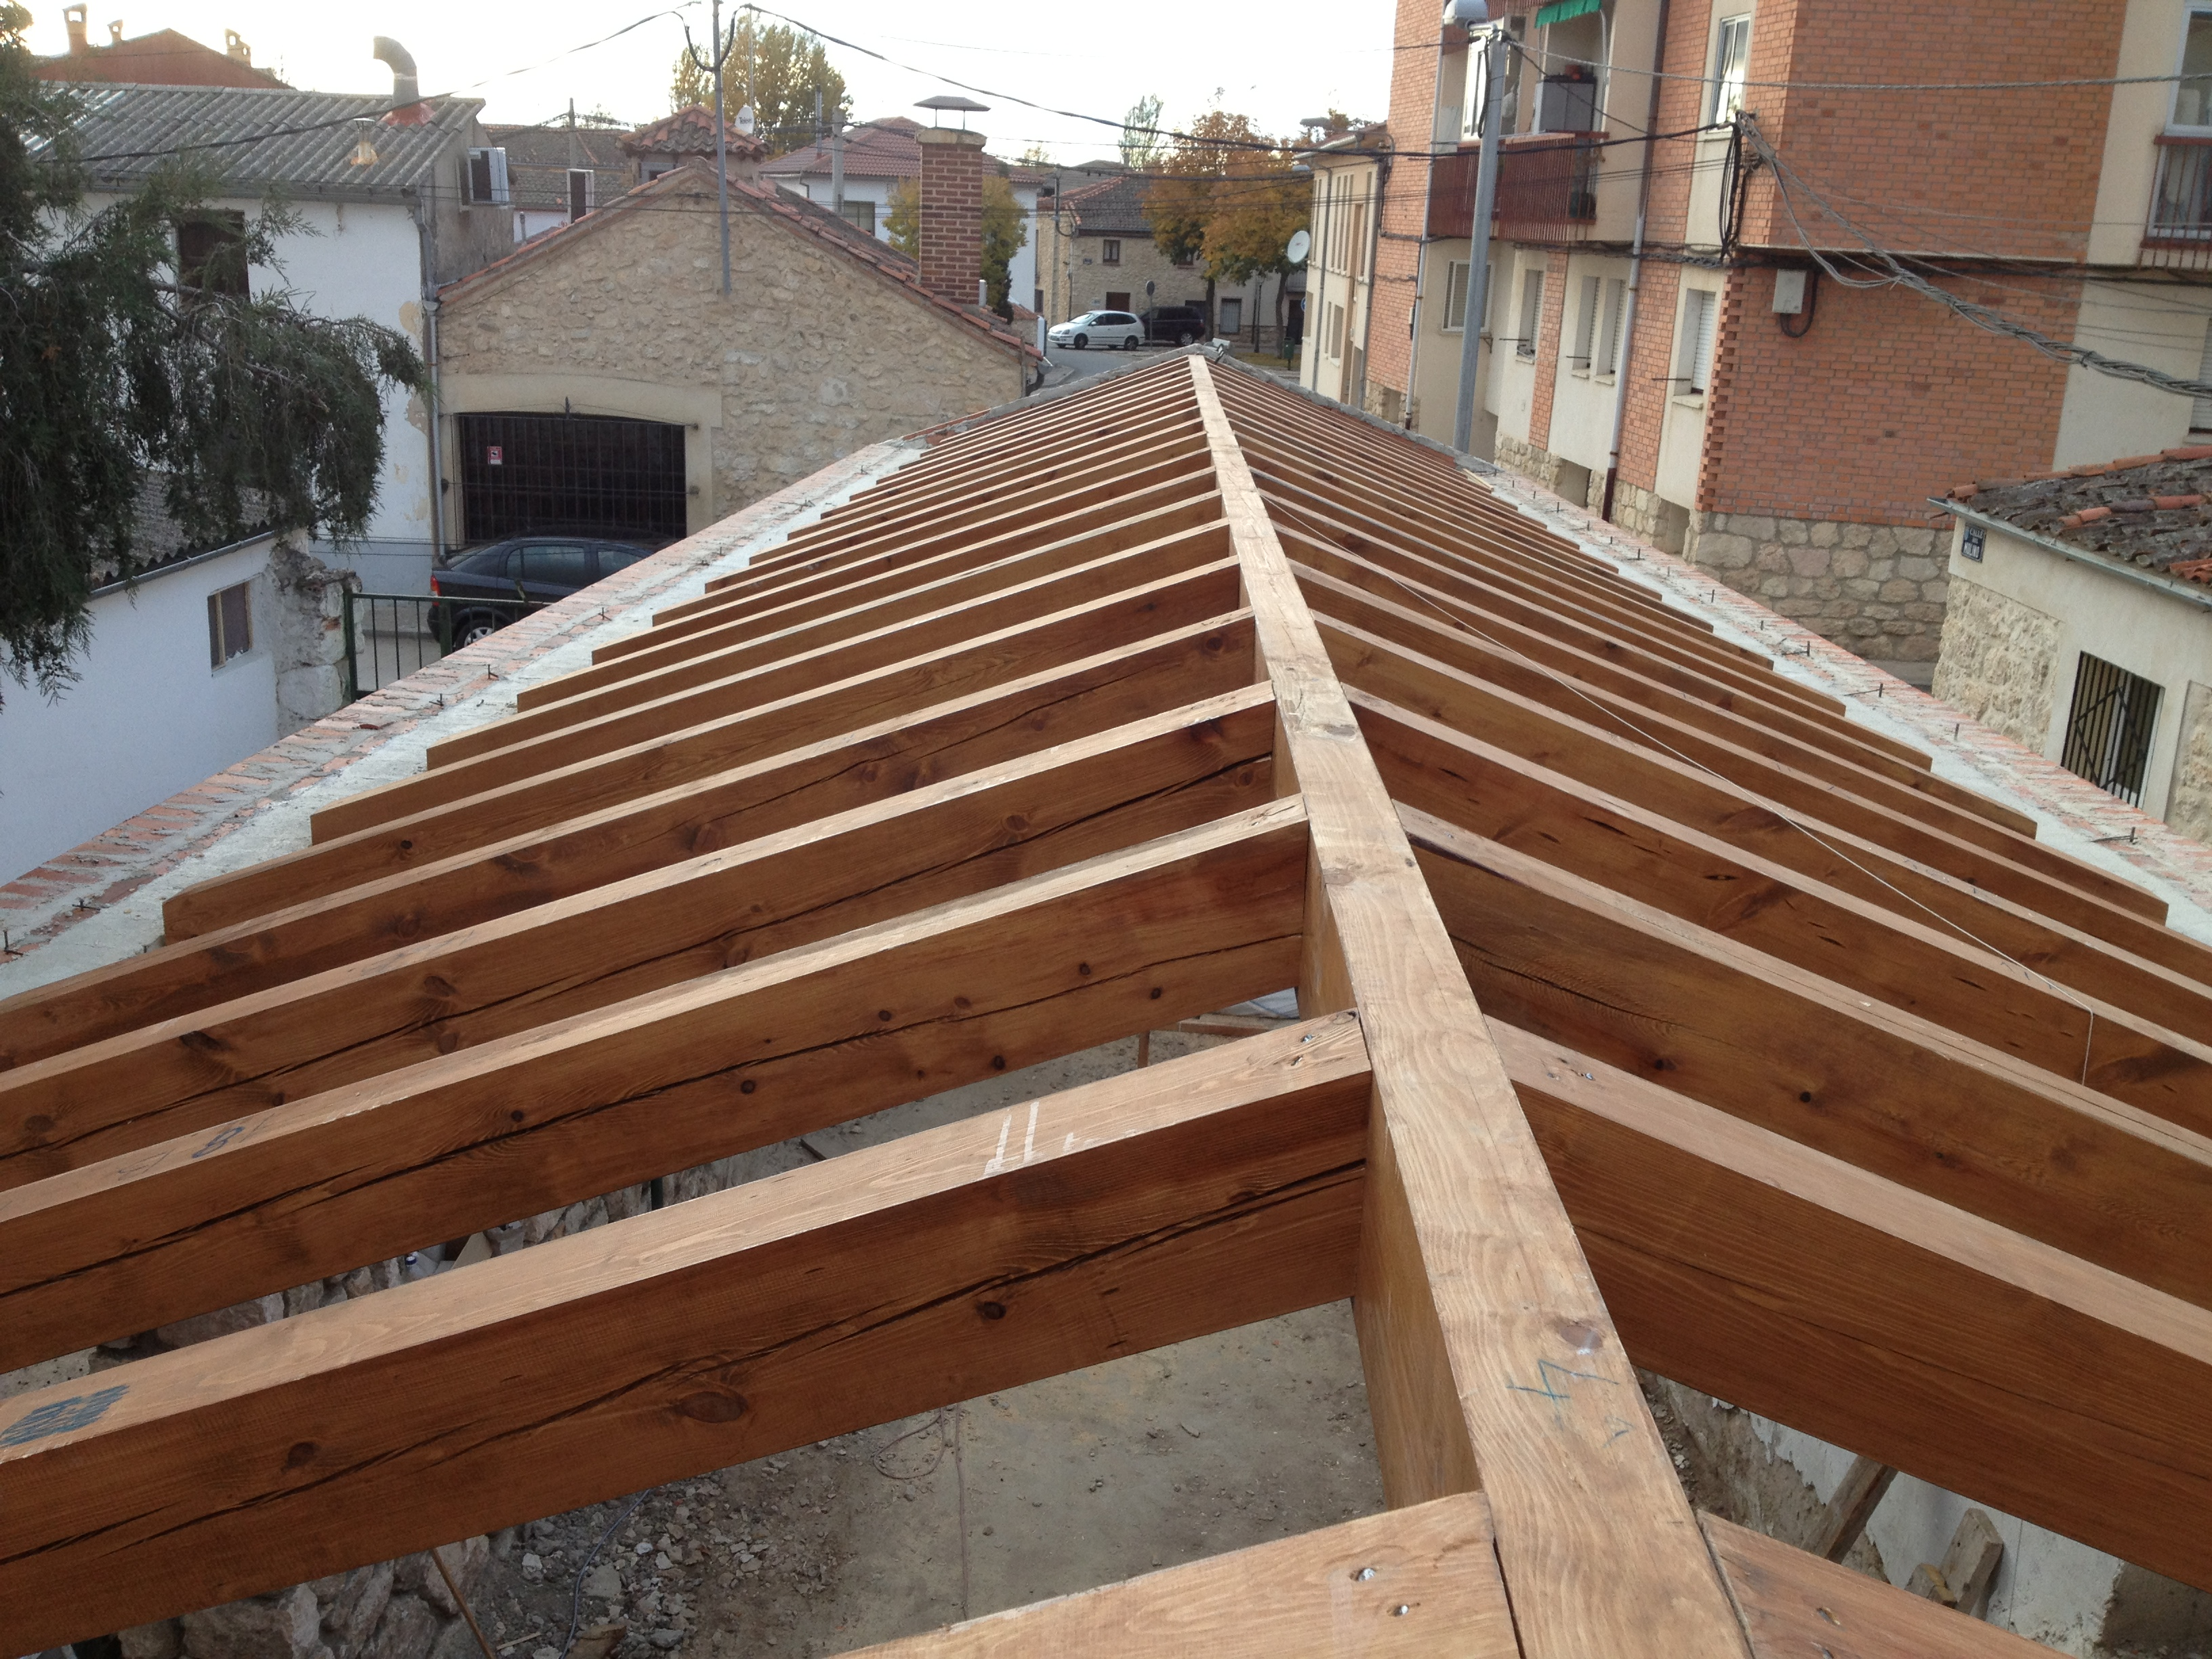 Cubiertas de madera carpinter a de prado - Estructura tejado madera ...